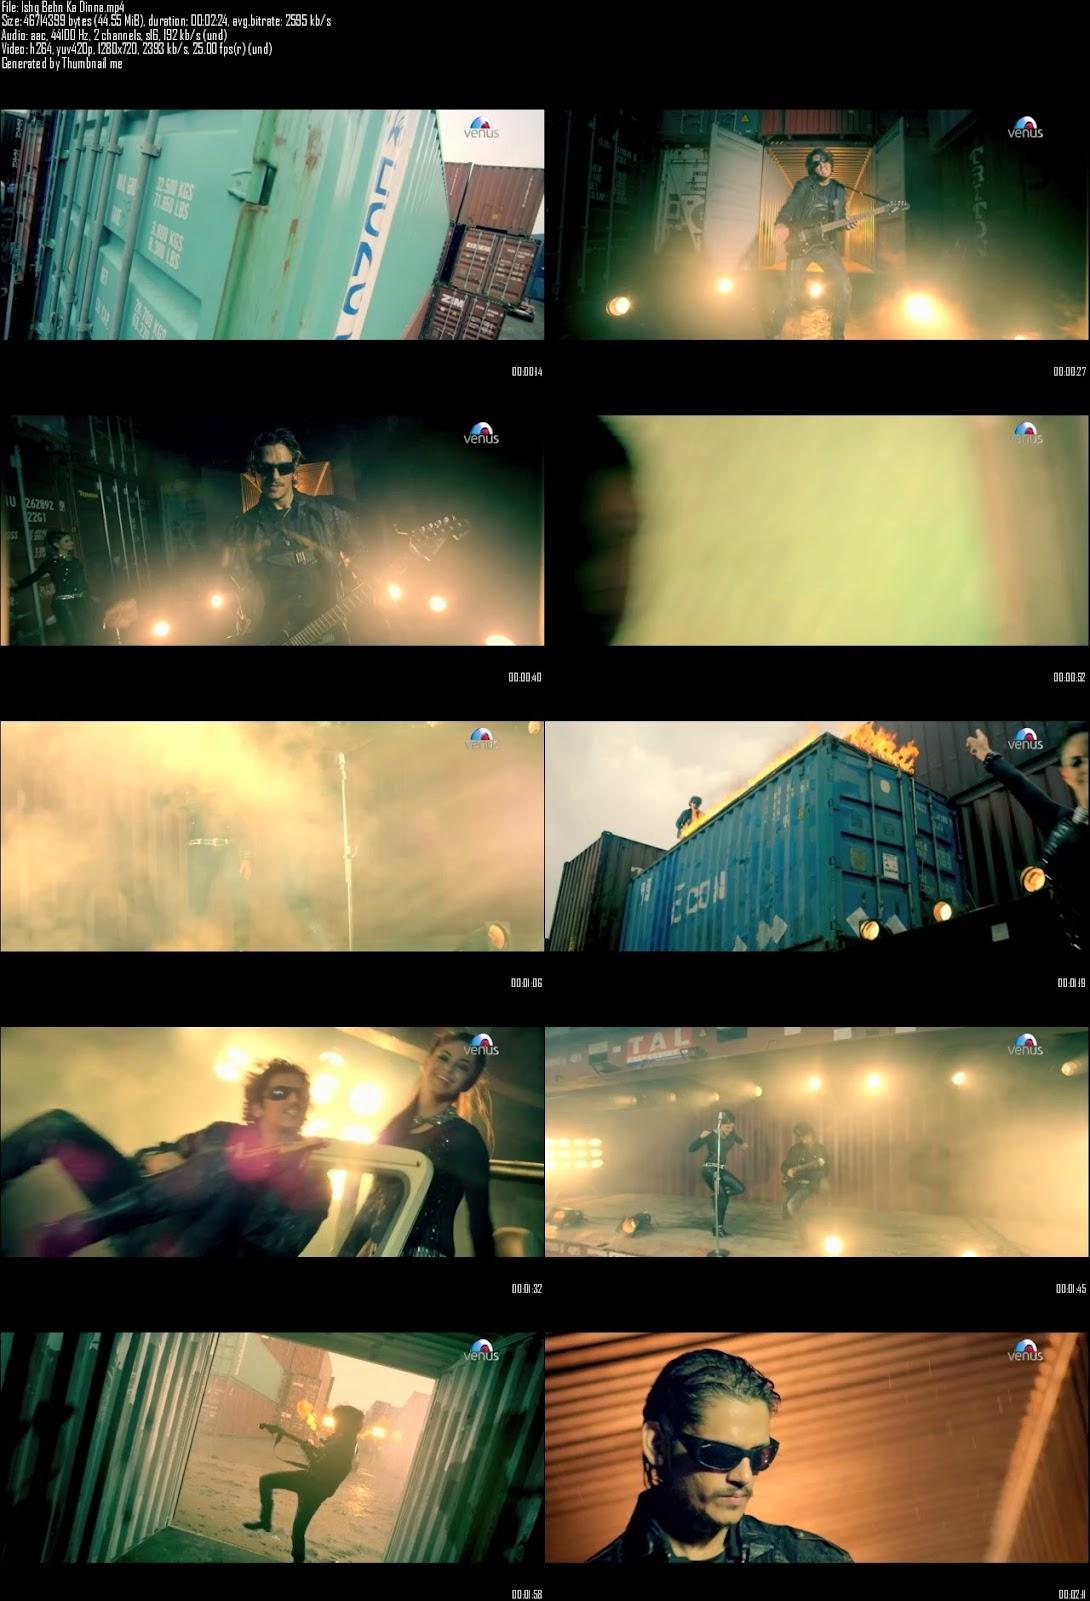 Ishq Behn Ka Dinna – Gang Of Ghosts (2014) Video | Song Free Download, Ishq Behn Ka Dinna – Gang Of Ghosts (2014) Video, Ishq Behn Ka Dinna – Gang Of Ghosts (2014) Video | Song Free Download.